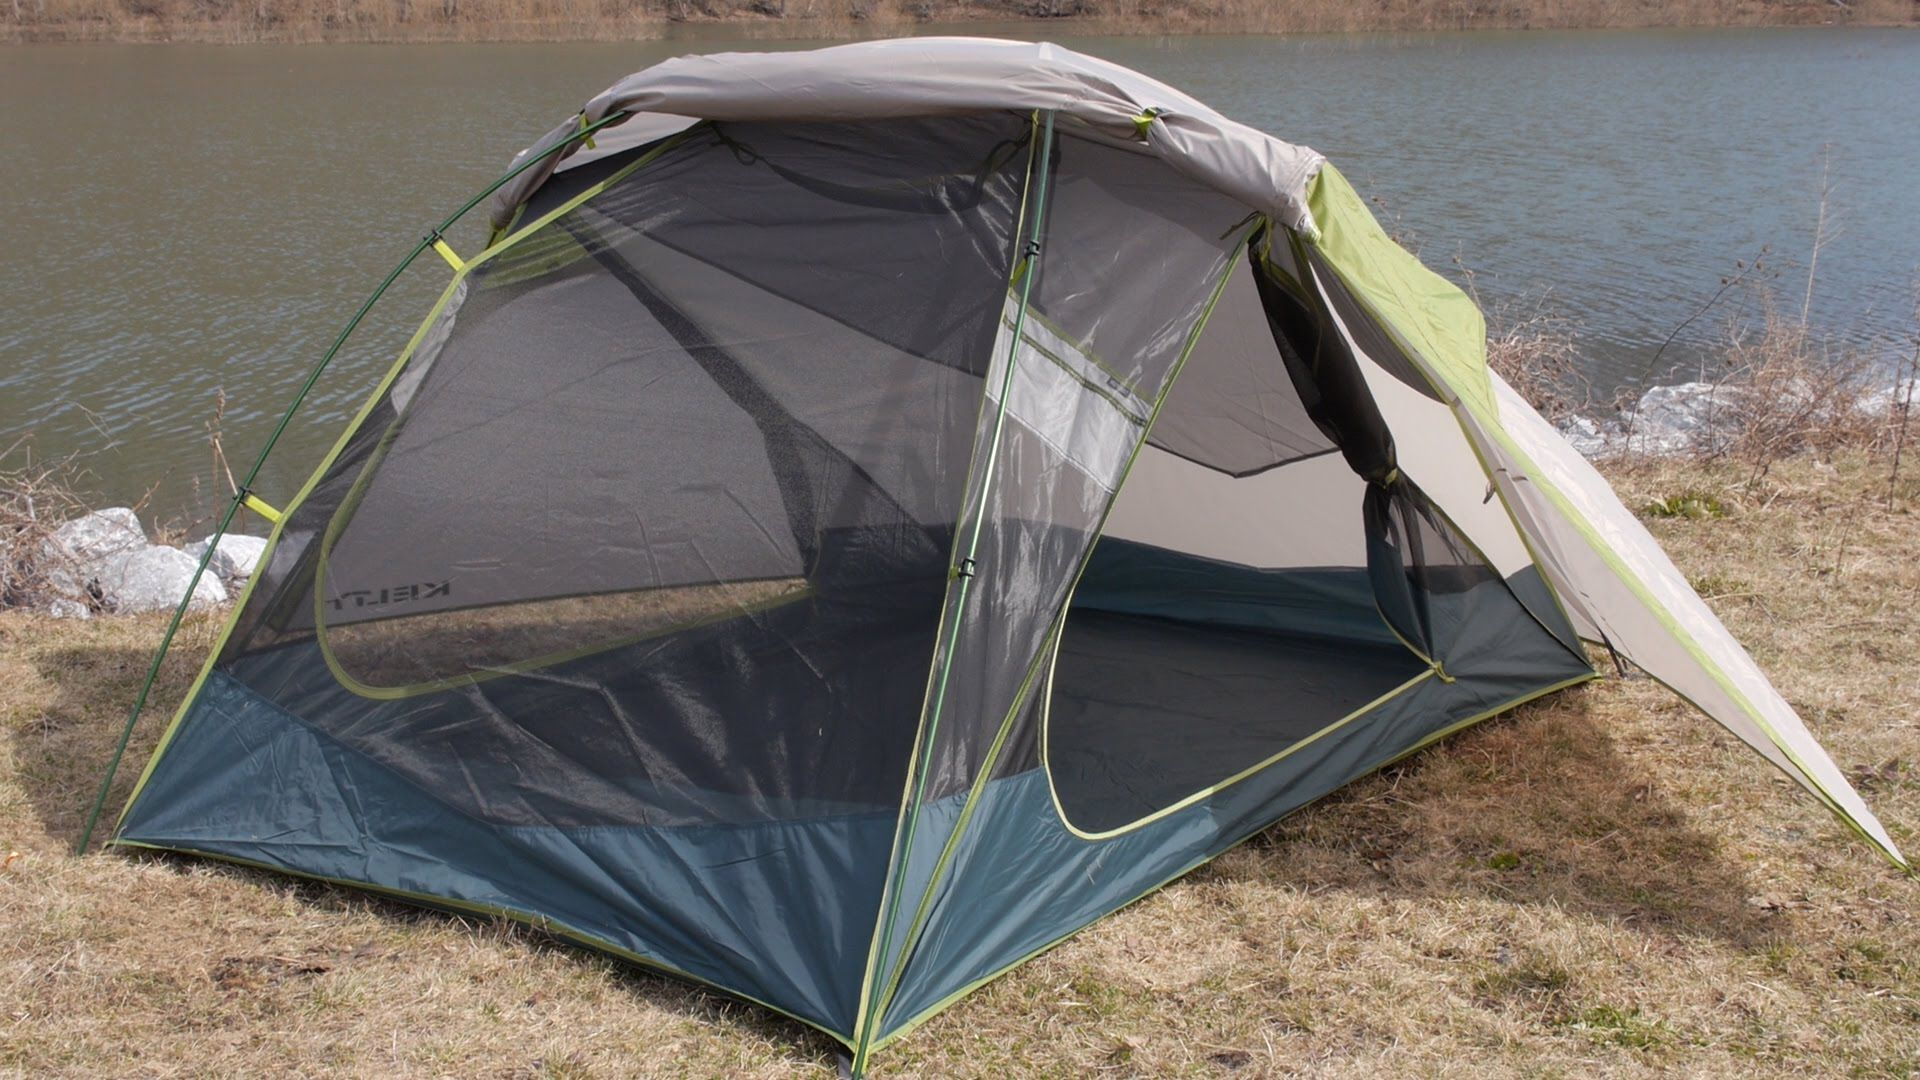 Kelty Trail Ridge 2 3-Season Backpacking Tent Video by Backcountry Edge & Kelty Trail Ridge 2 3-Season Backpacking Tent Video by Backcountry ...